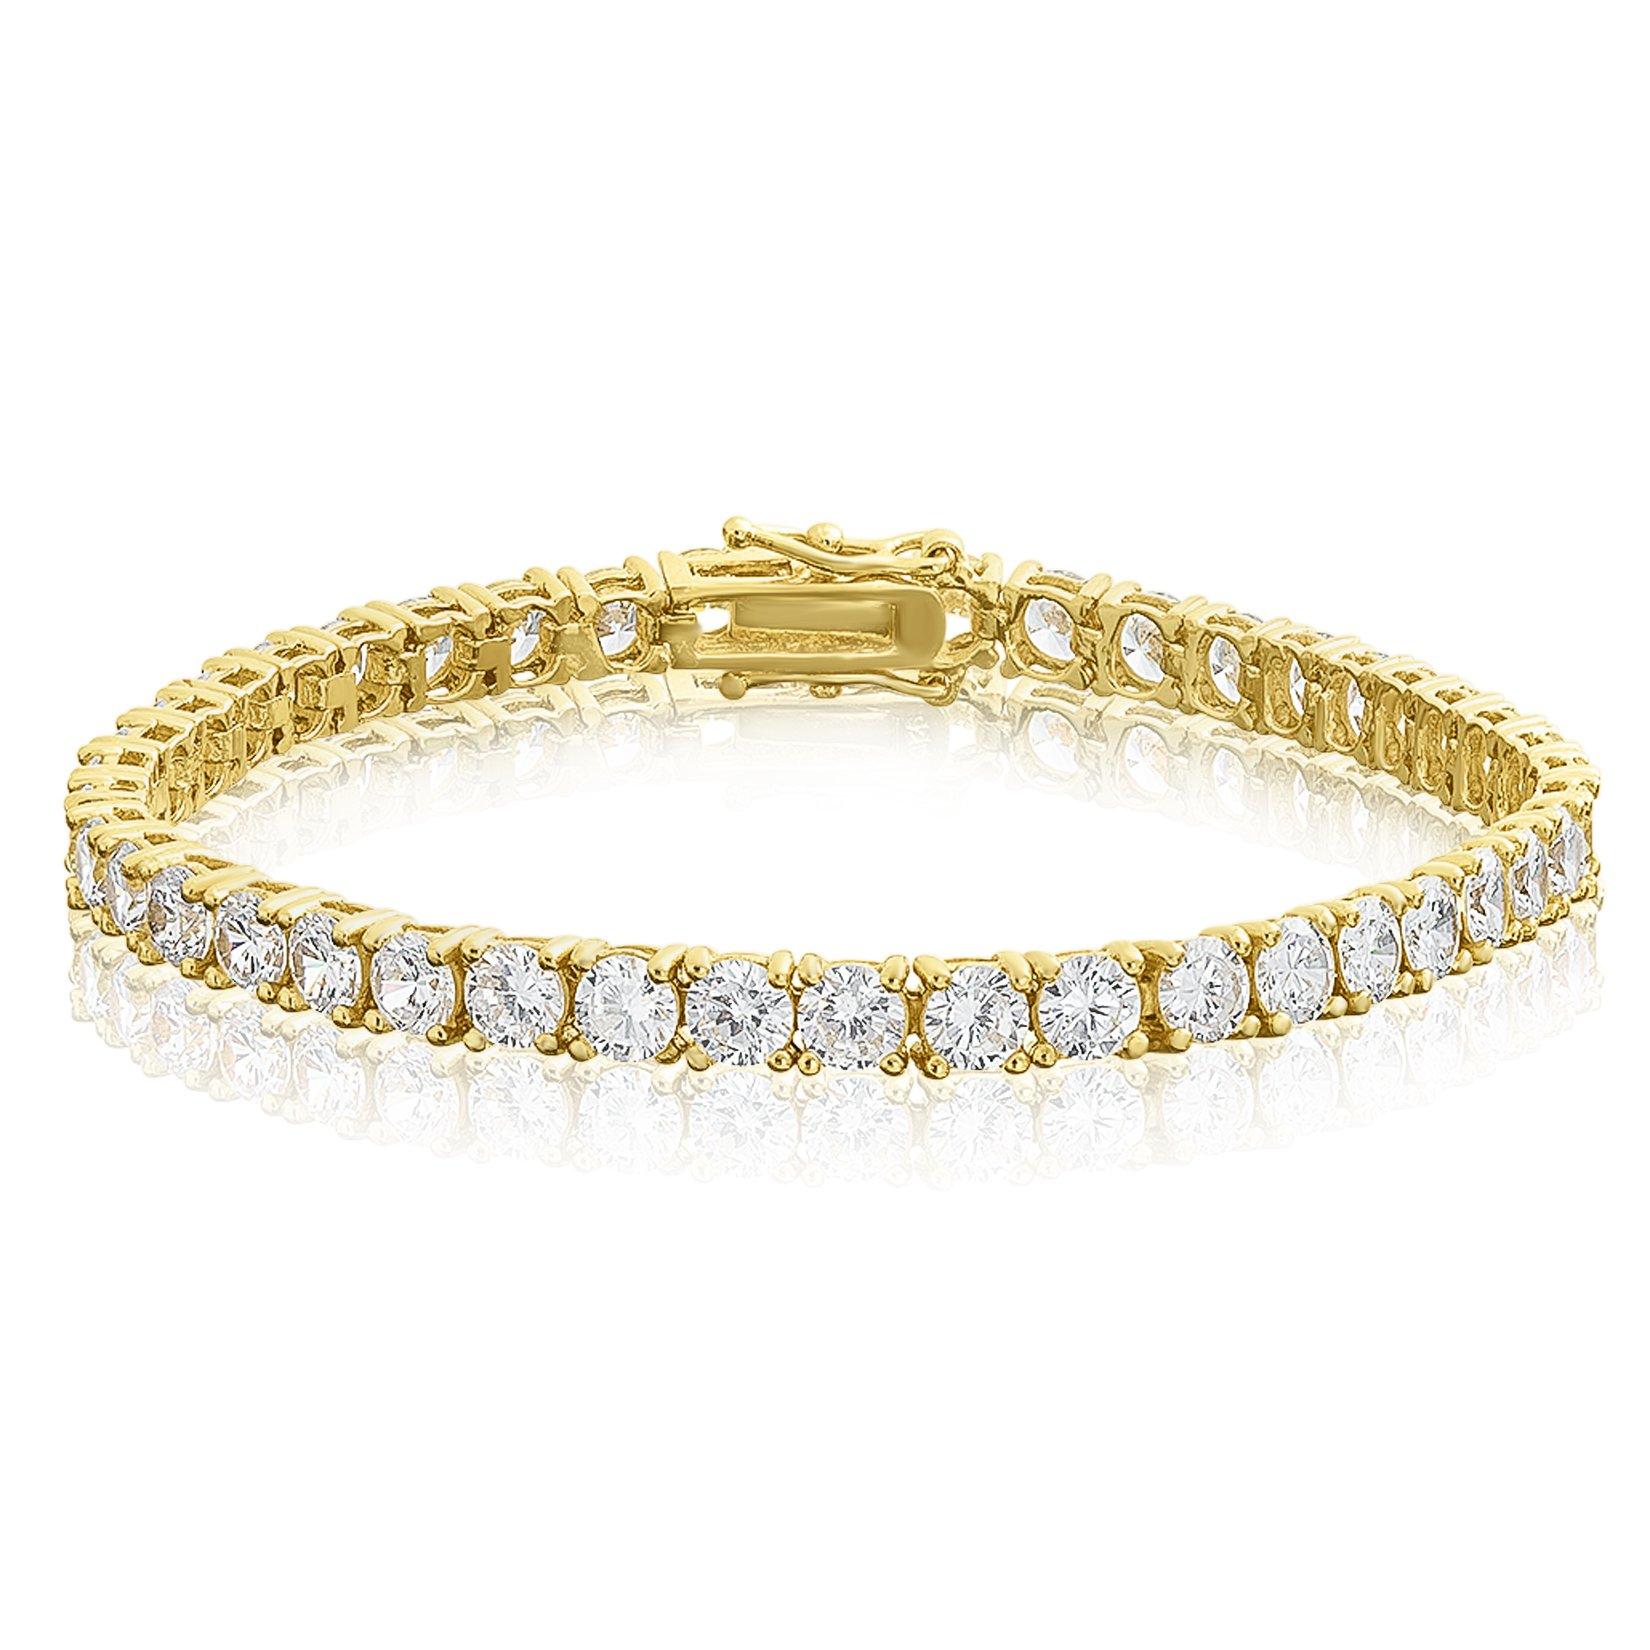 KEZEF Creations Cubic Zirconia Tennis Bracelet Round Cut 4mm 14K Gold Plated Brass 8 inch Hypoallergenic for Women